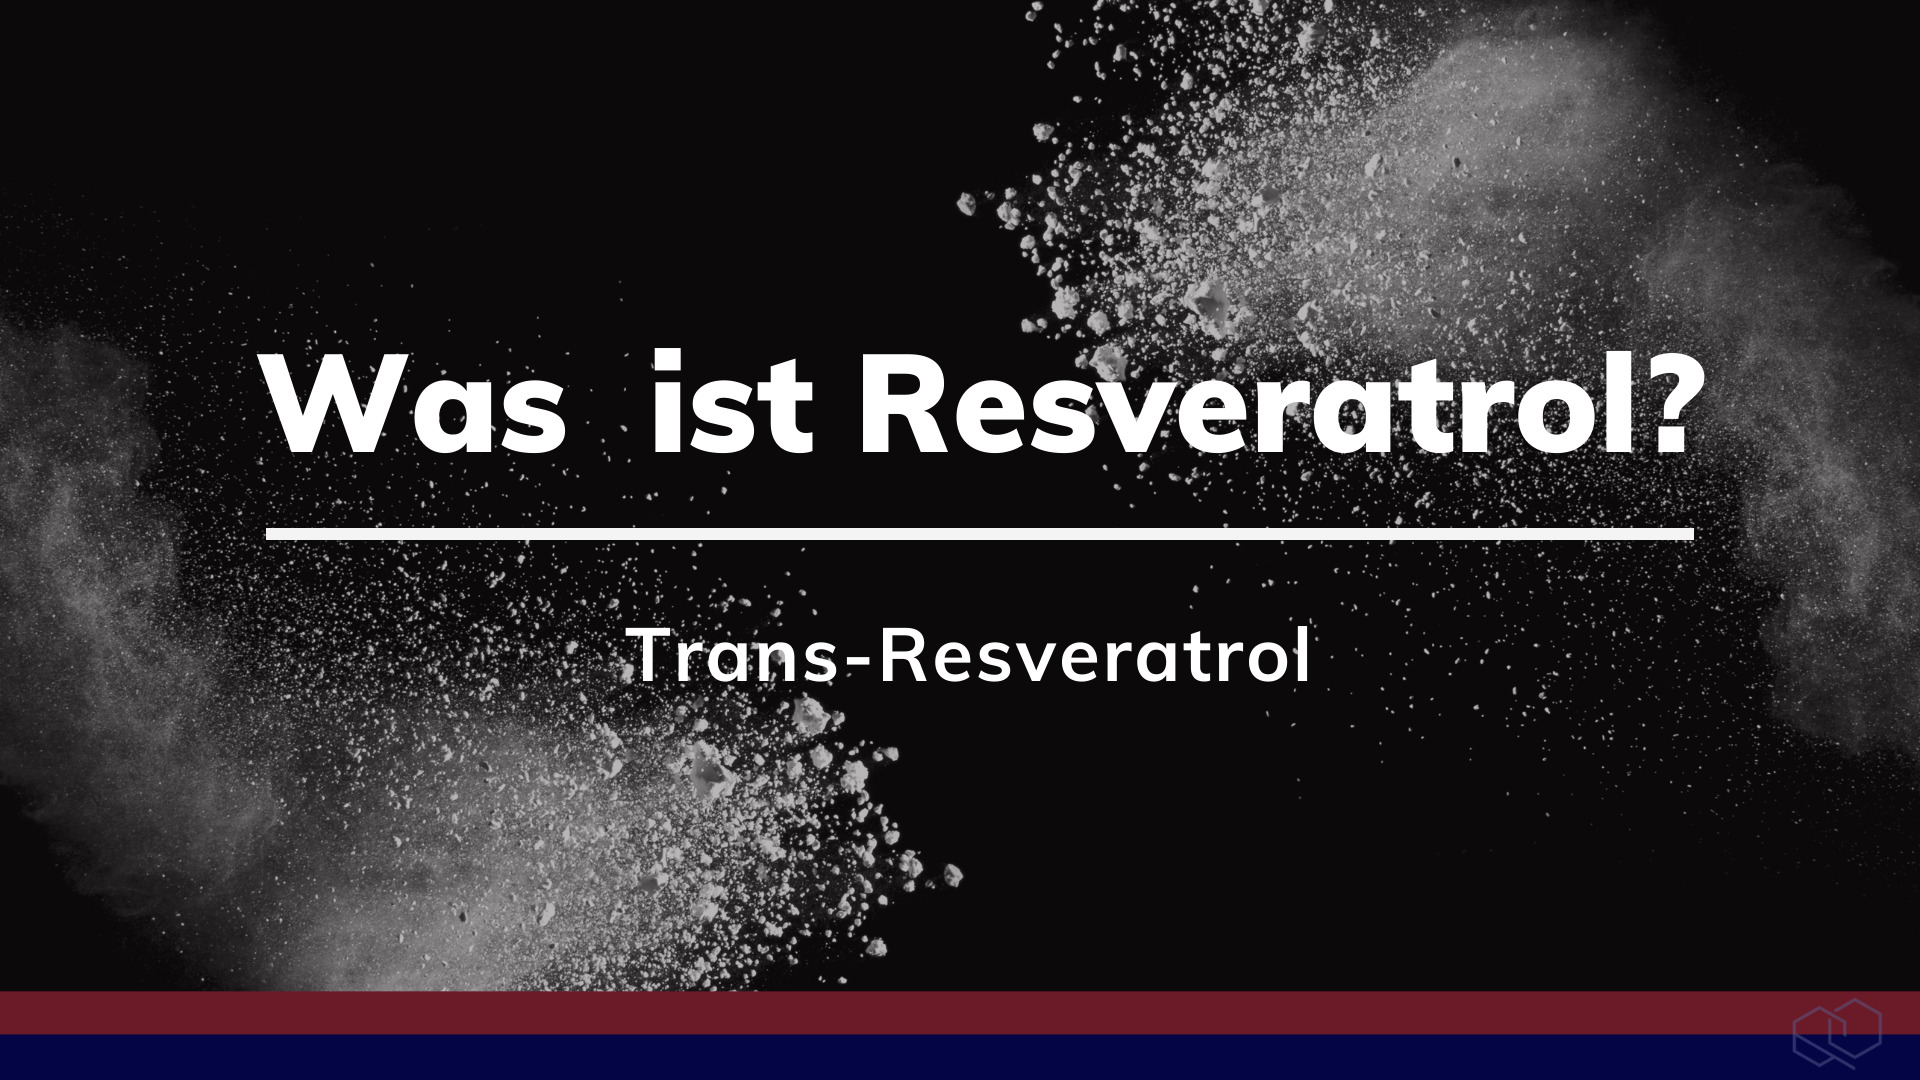 Was ist Resveratrol?